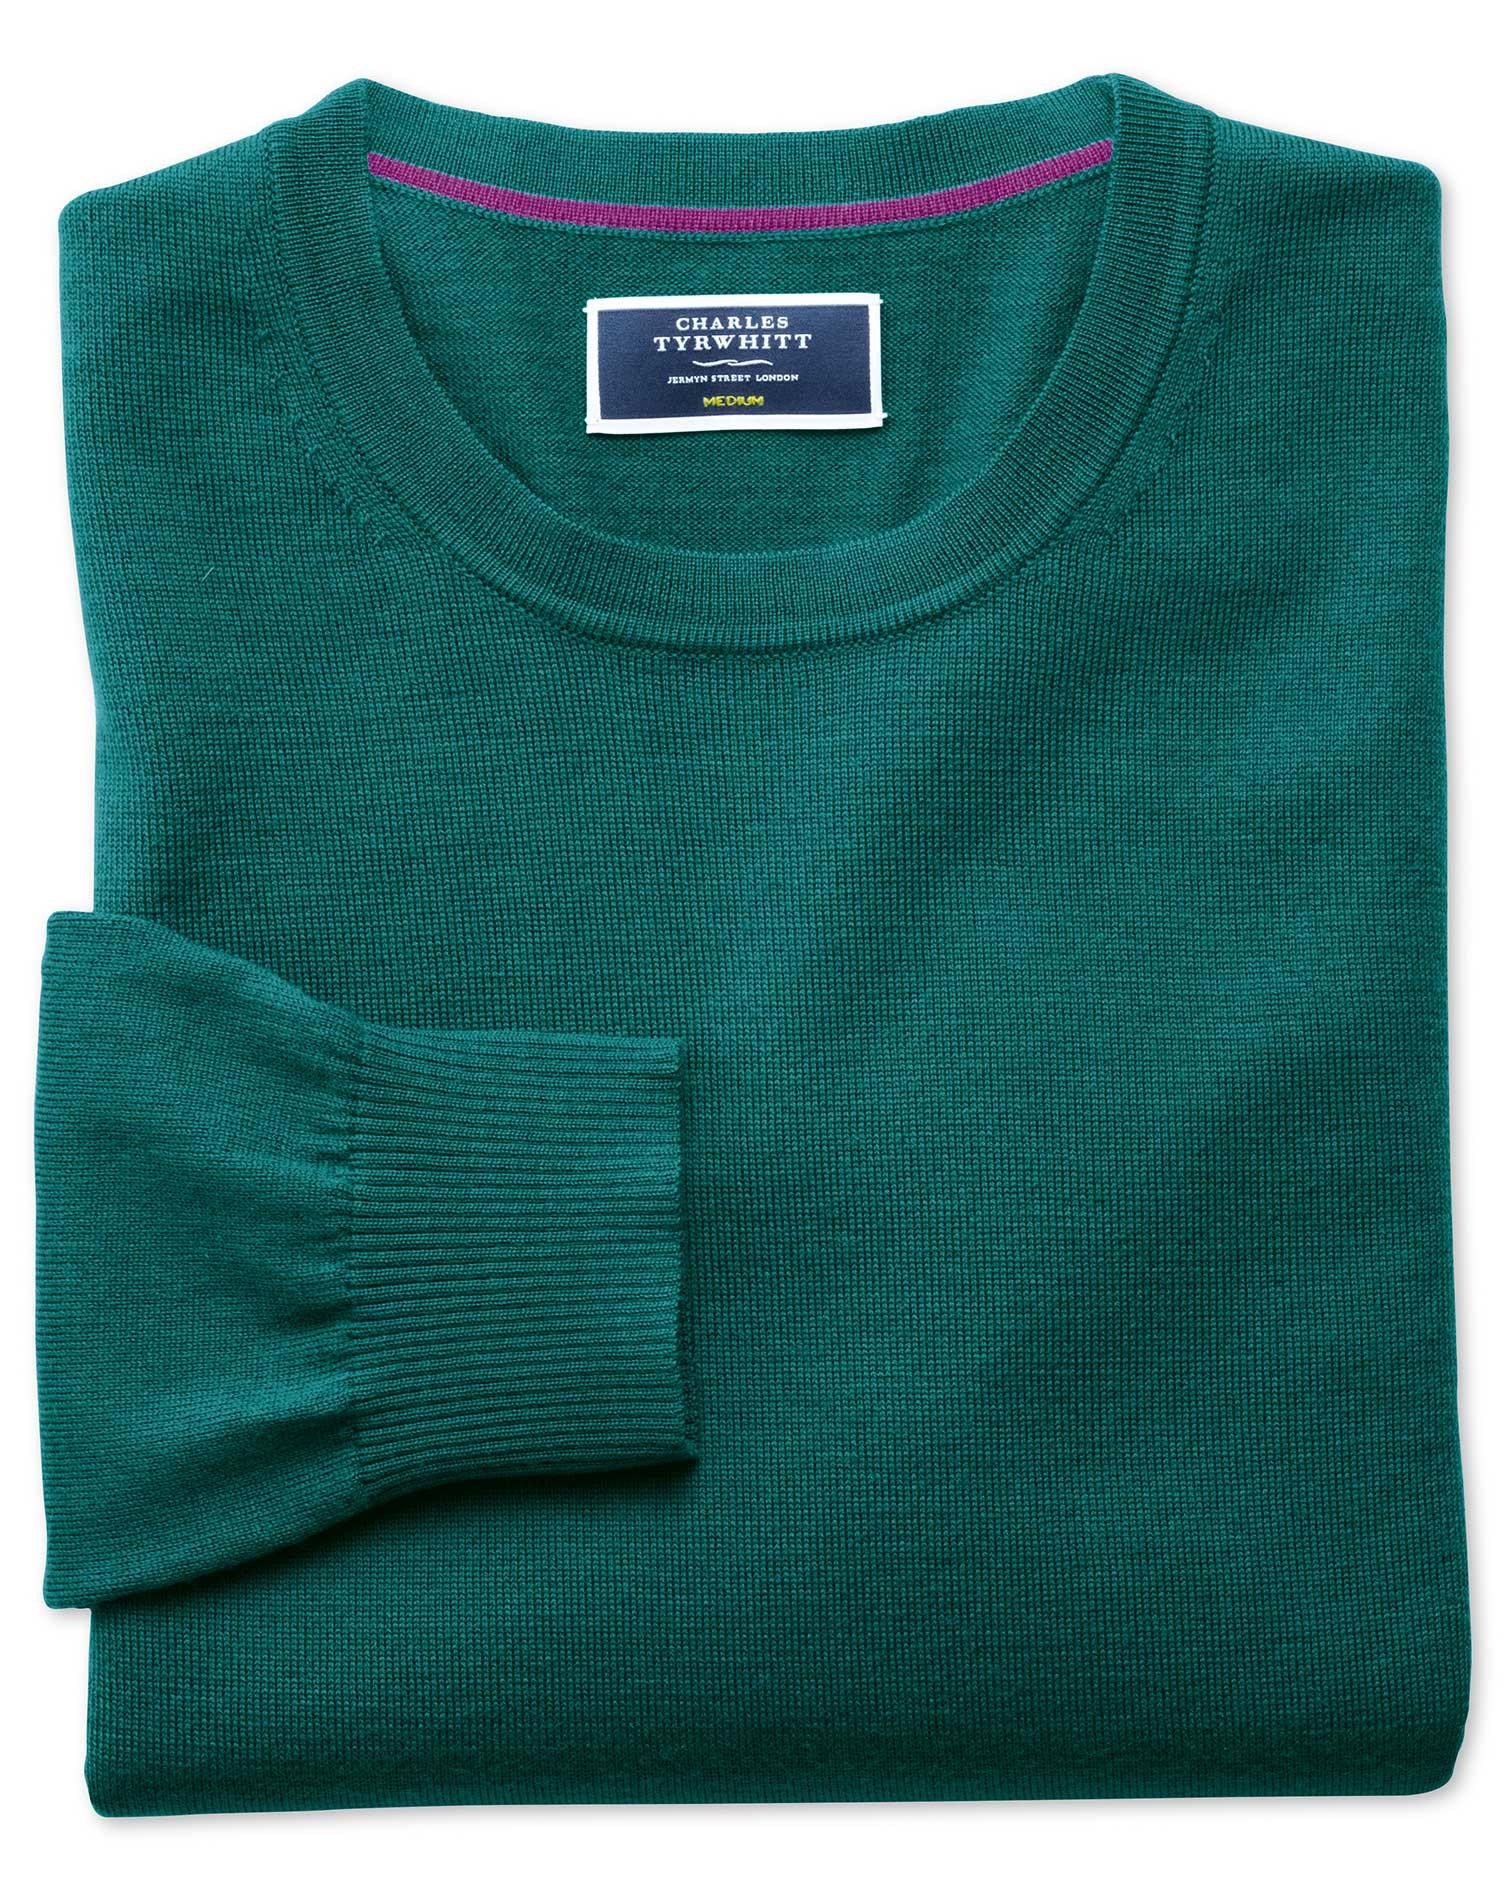 Teal Merino Wool Crew Neck Jumper Size Large by Charles Tyrwhitt